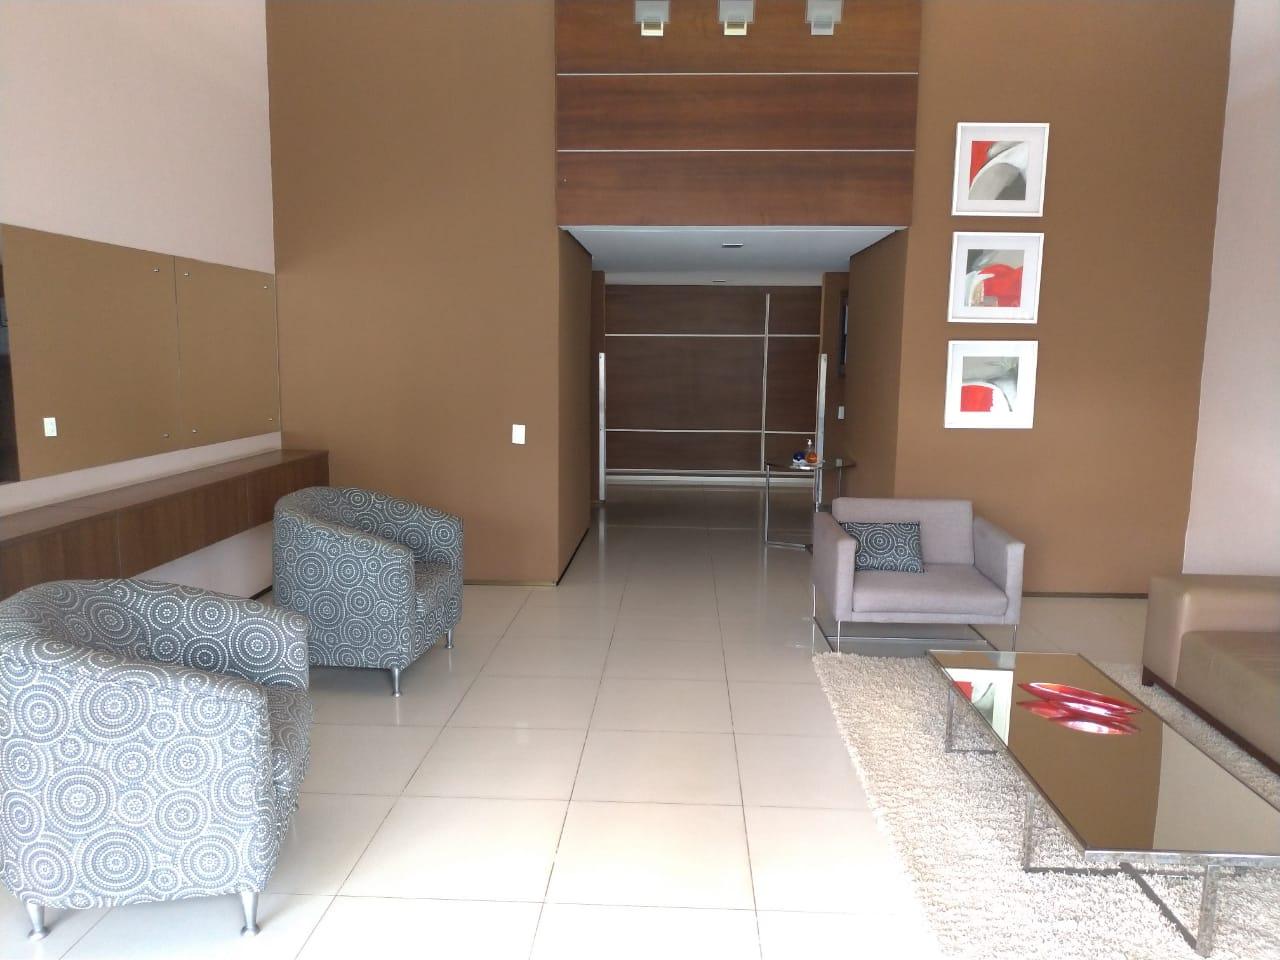 Apartamento venda bairro de Fátima Teresina- Murillo Lago Imóveis